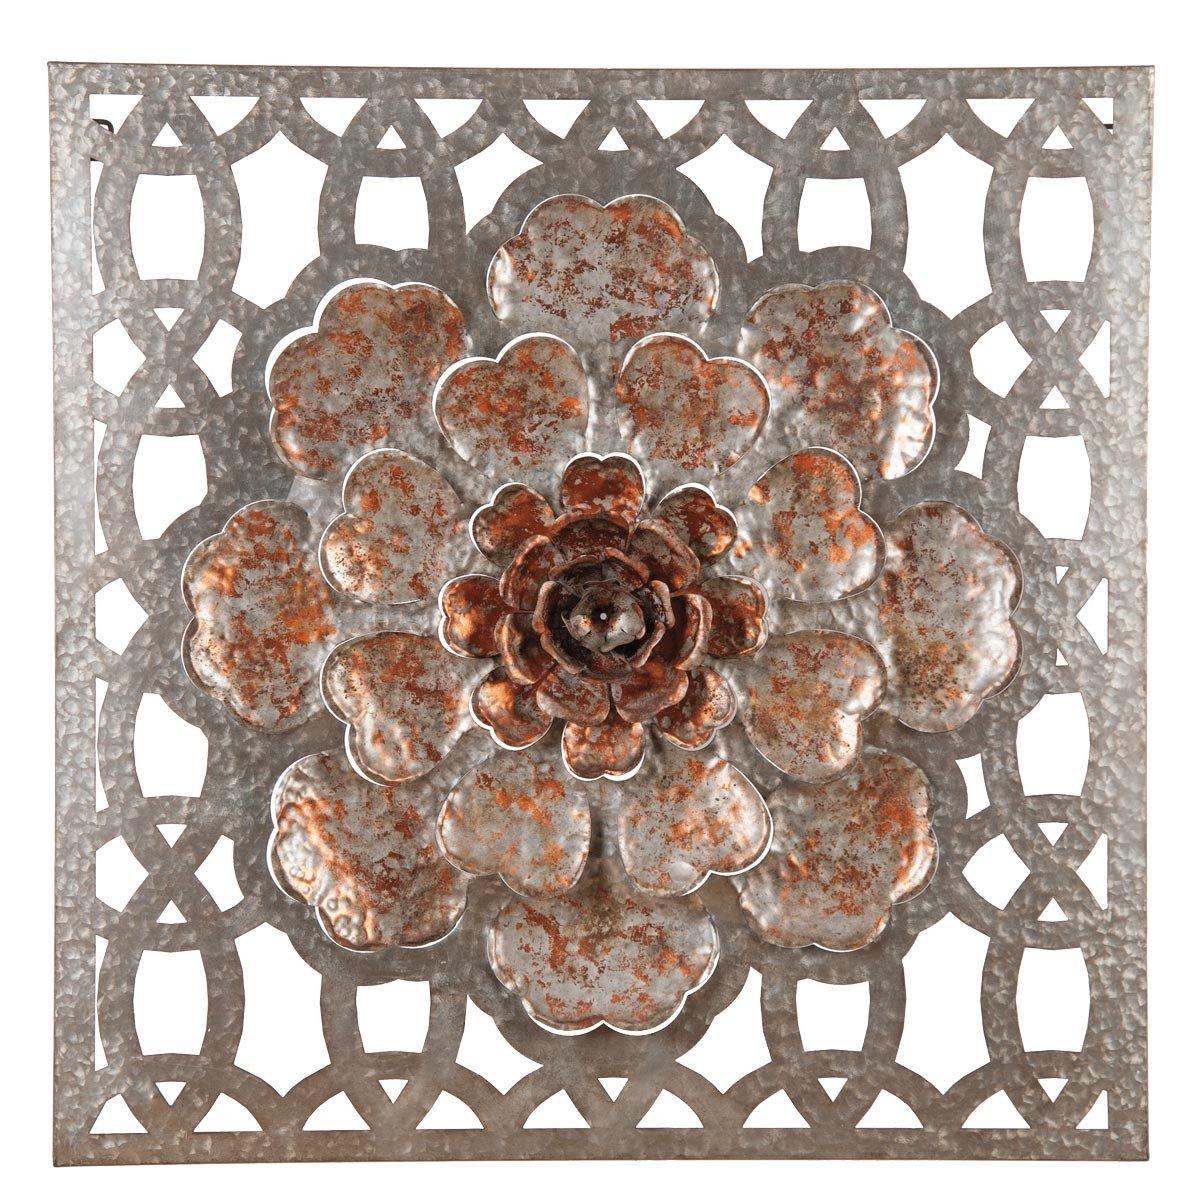 Amazon.com: Foreside Home and Garden Flower Window Pane, 35.75 x ...